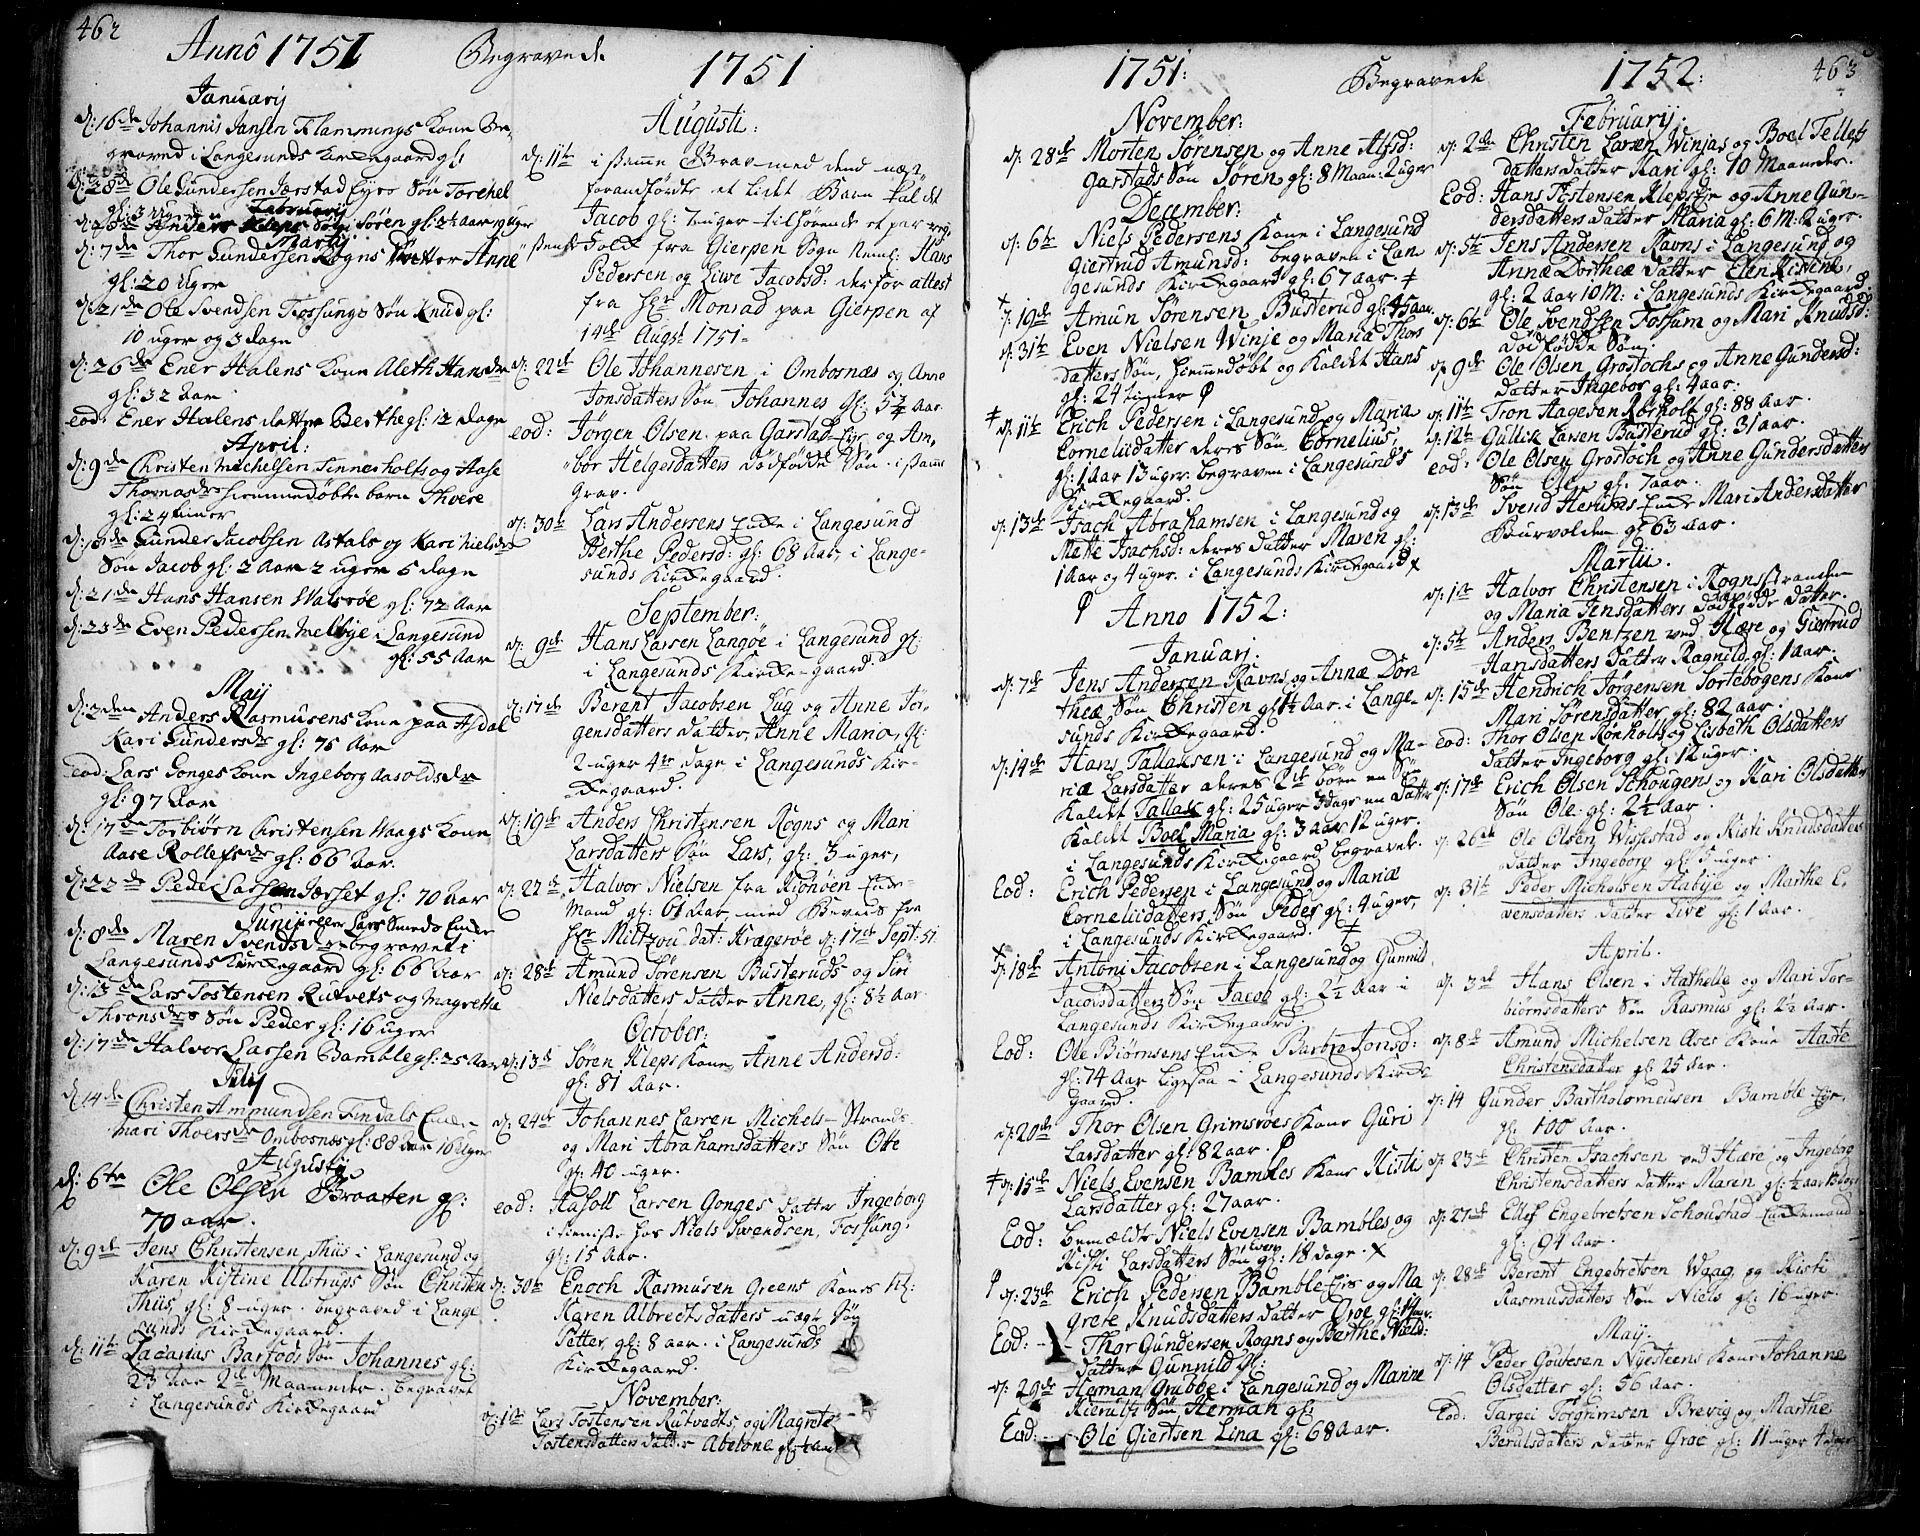 SAKO, Bamble kirkebøker, F/Fa/L0001: Ministerialbok nr. I 1, 1702-1774, s. 462-463